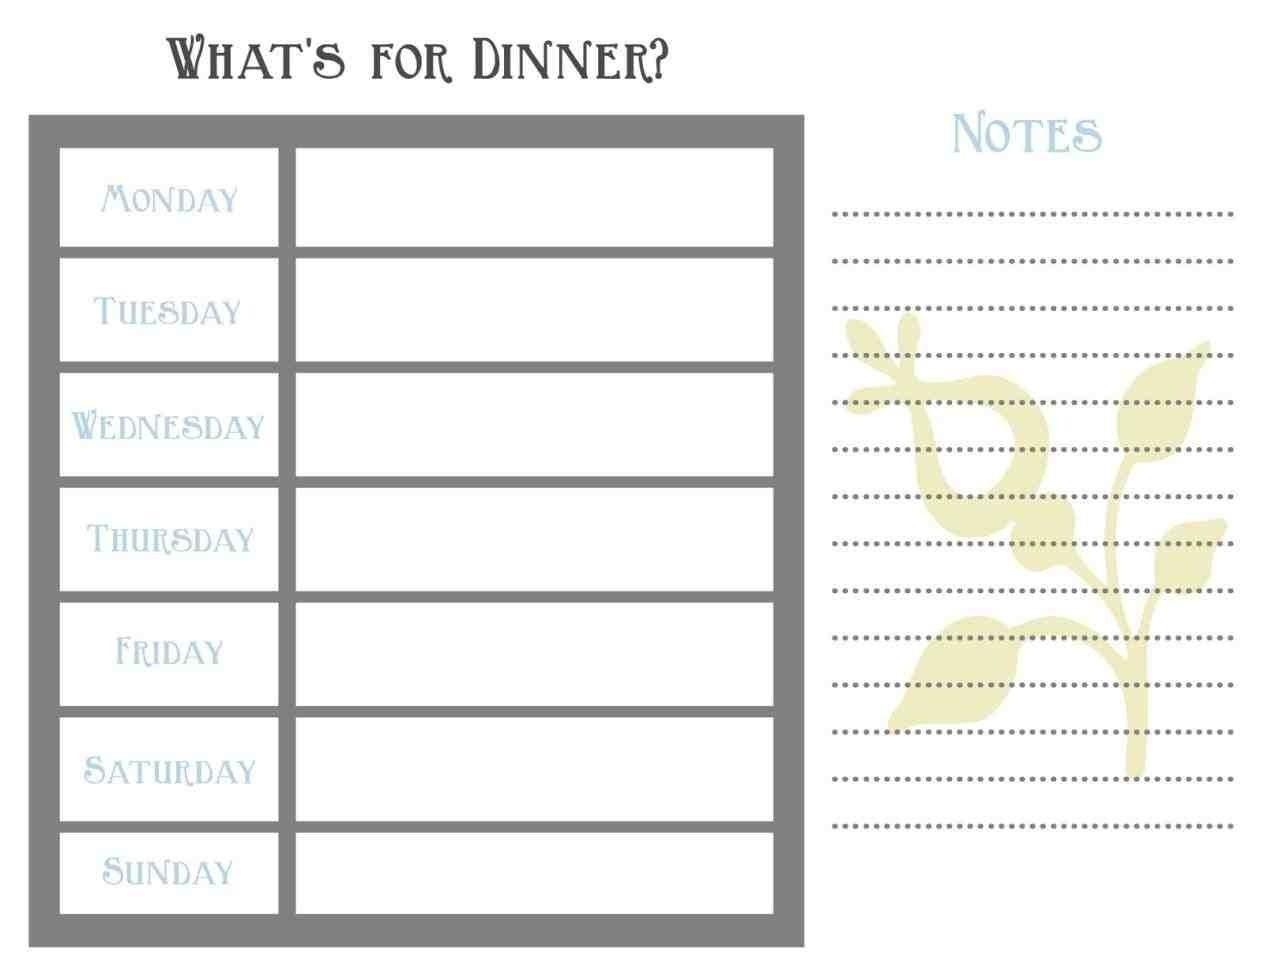 Blank Weekly Planner Shefftunes Tk Ay Template Printable Menu Word intended for 7 Day Weekly Planner Template Printable